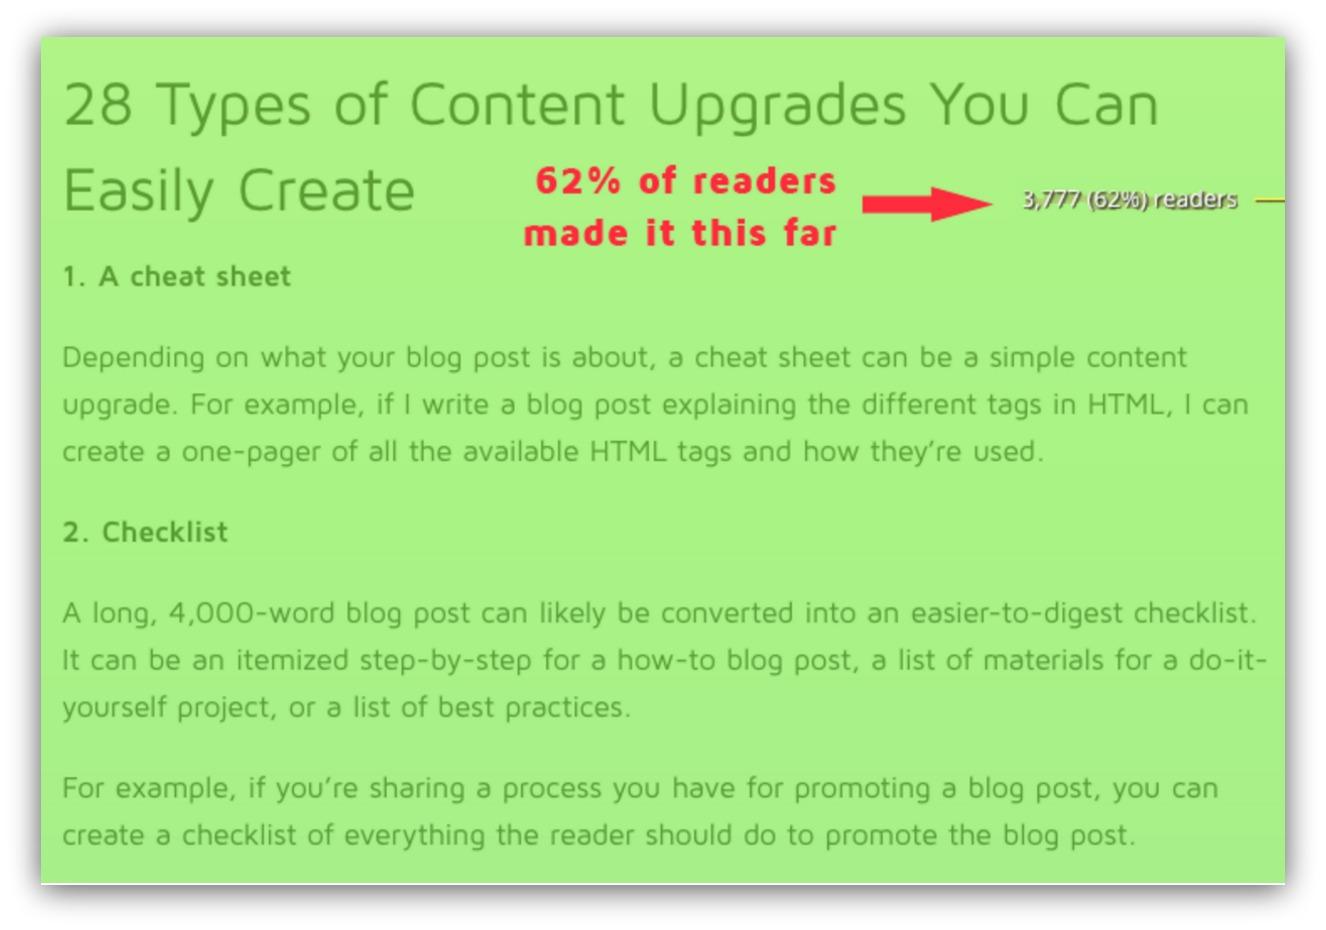 easy content upgrades